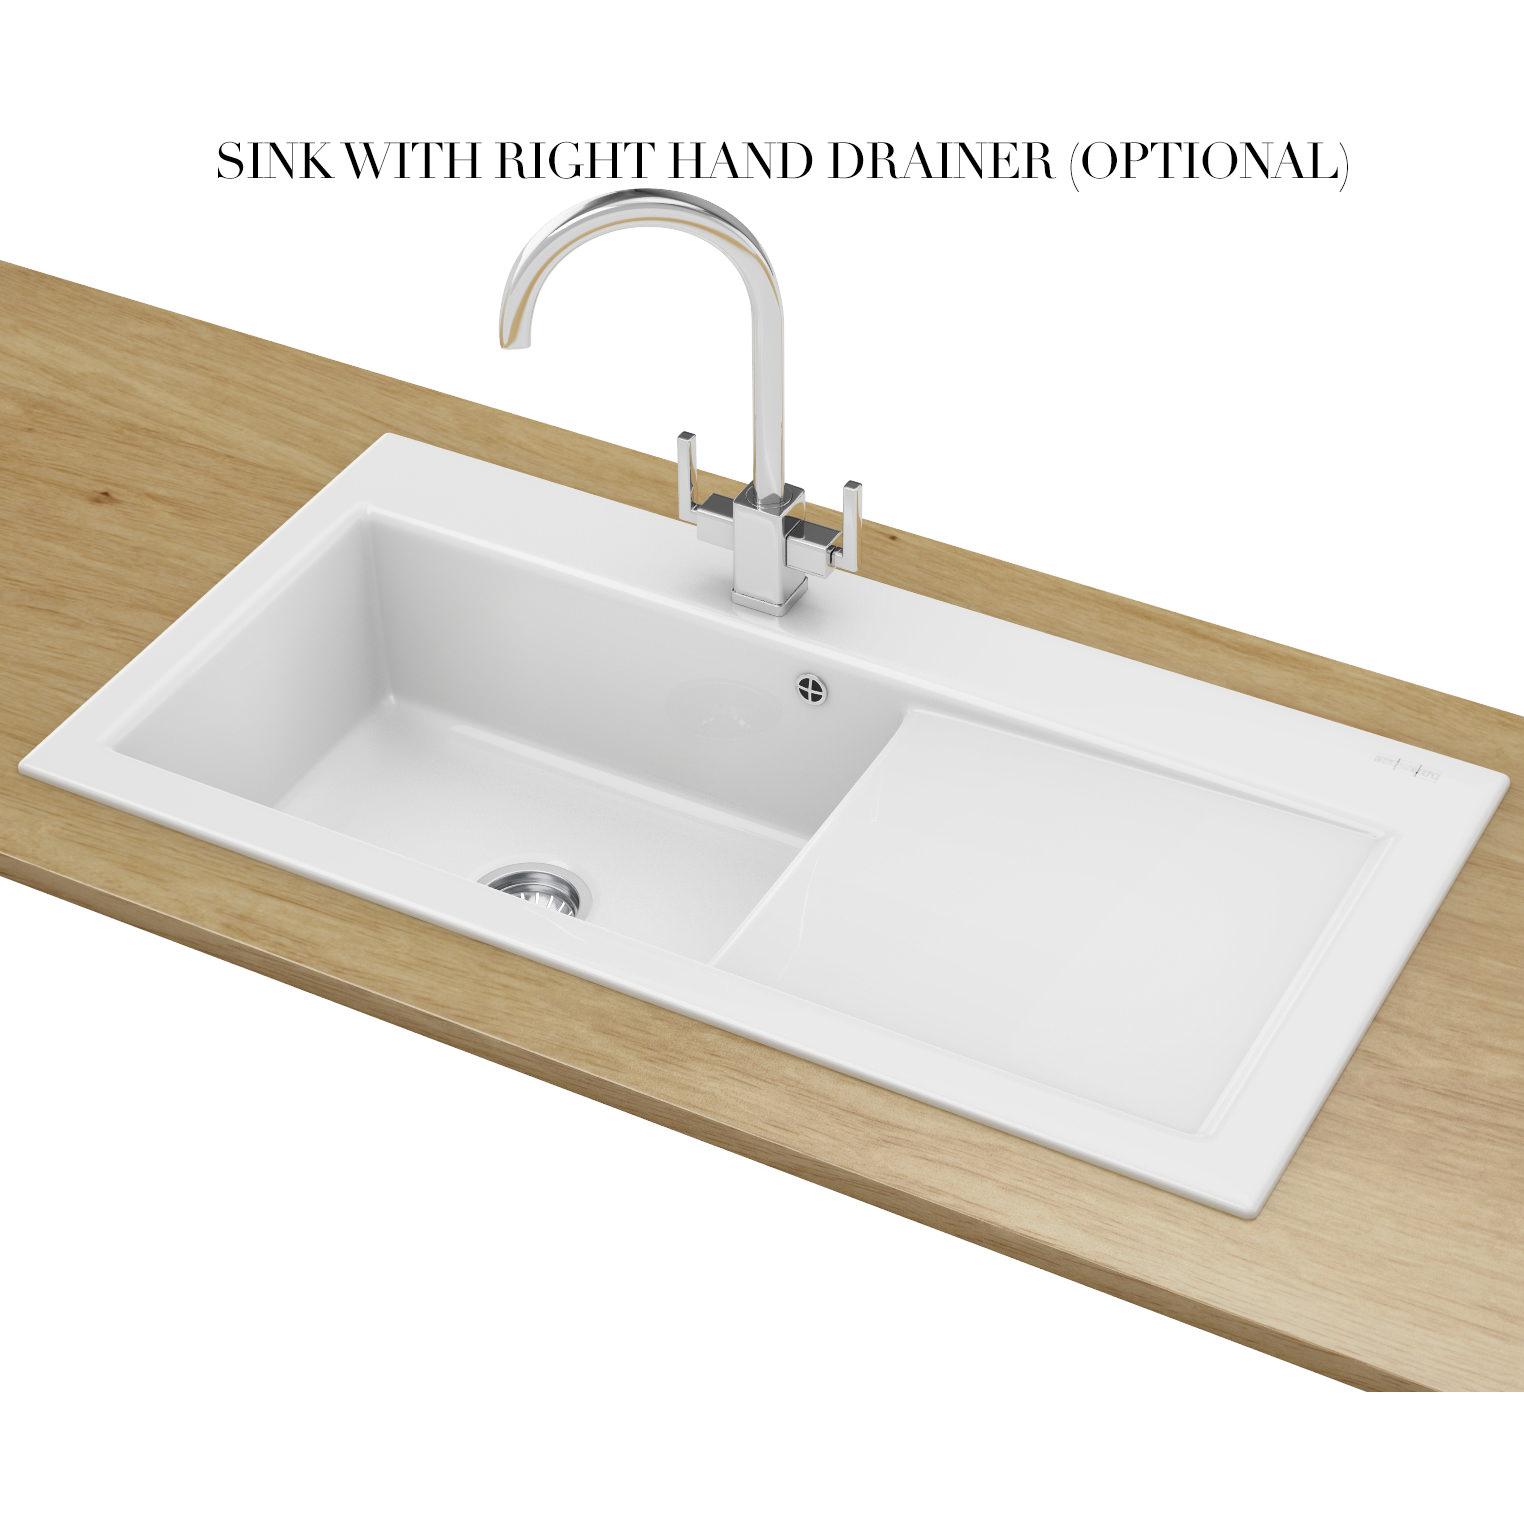 Franke White Ceramic Sink : Franke Mythos MTK 611 Ceramic White 1.0 Bowl Inset Sink 124.0050.117